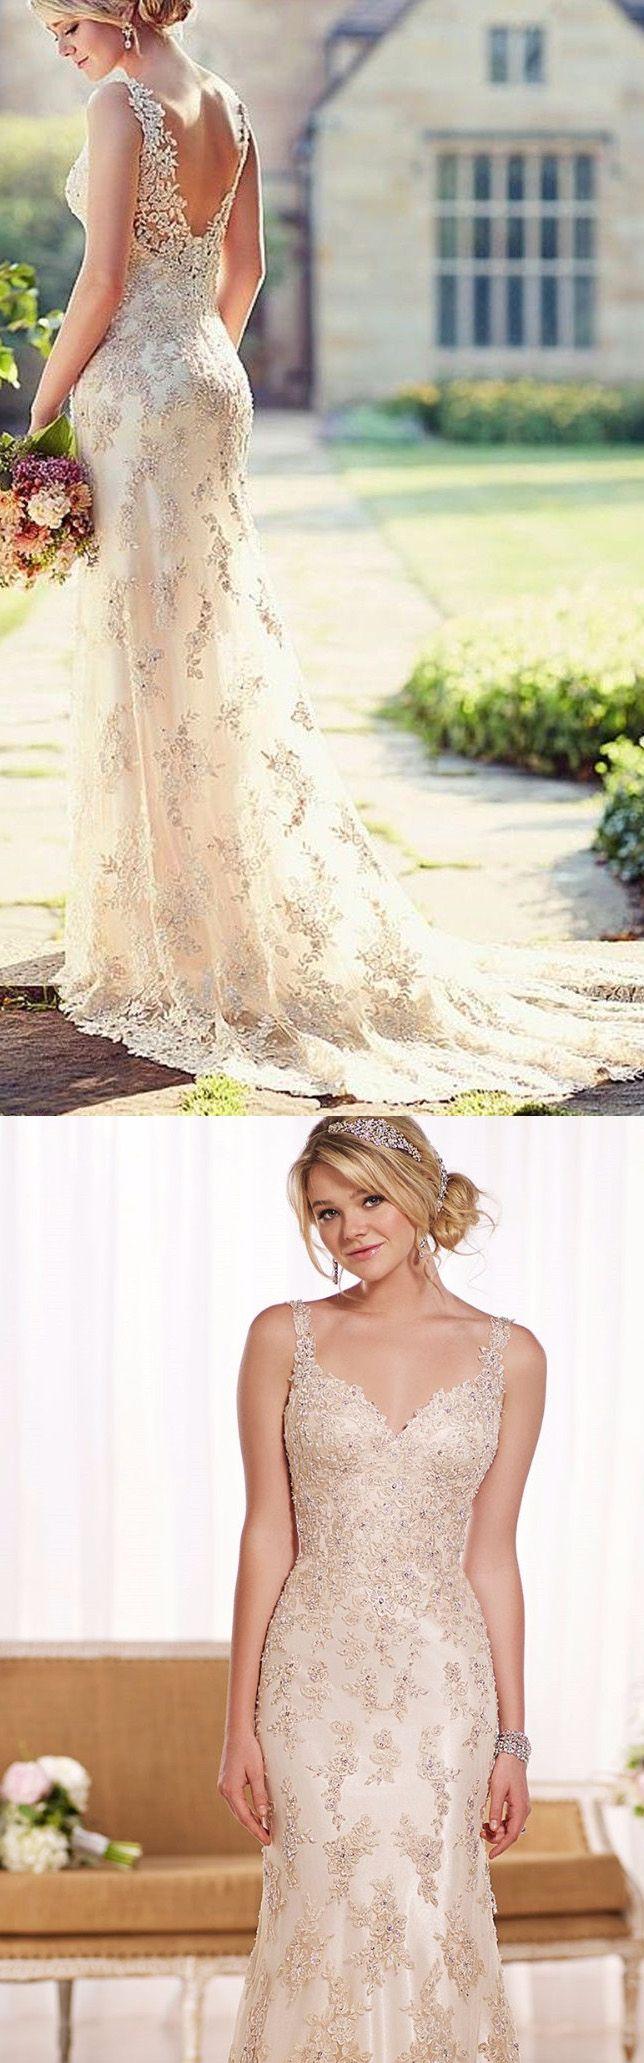 Discount sheathcolumn wedding dresses long white dresses with